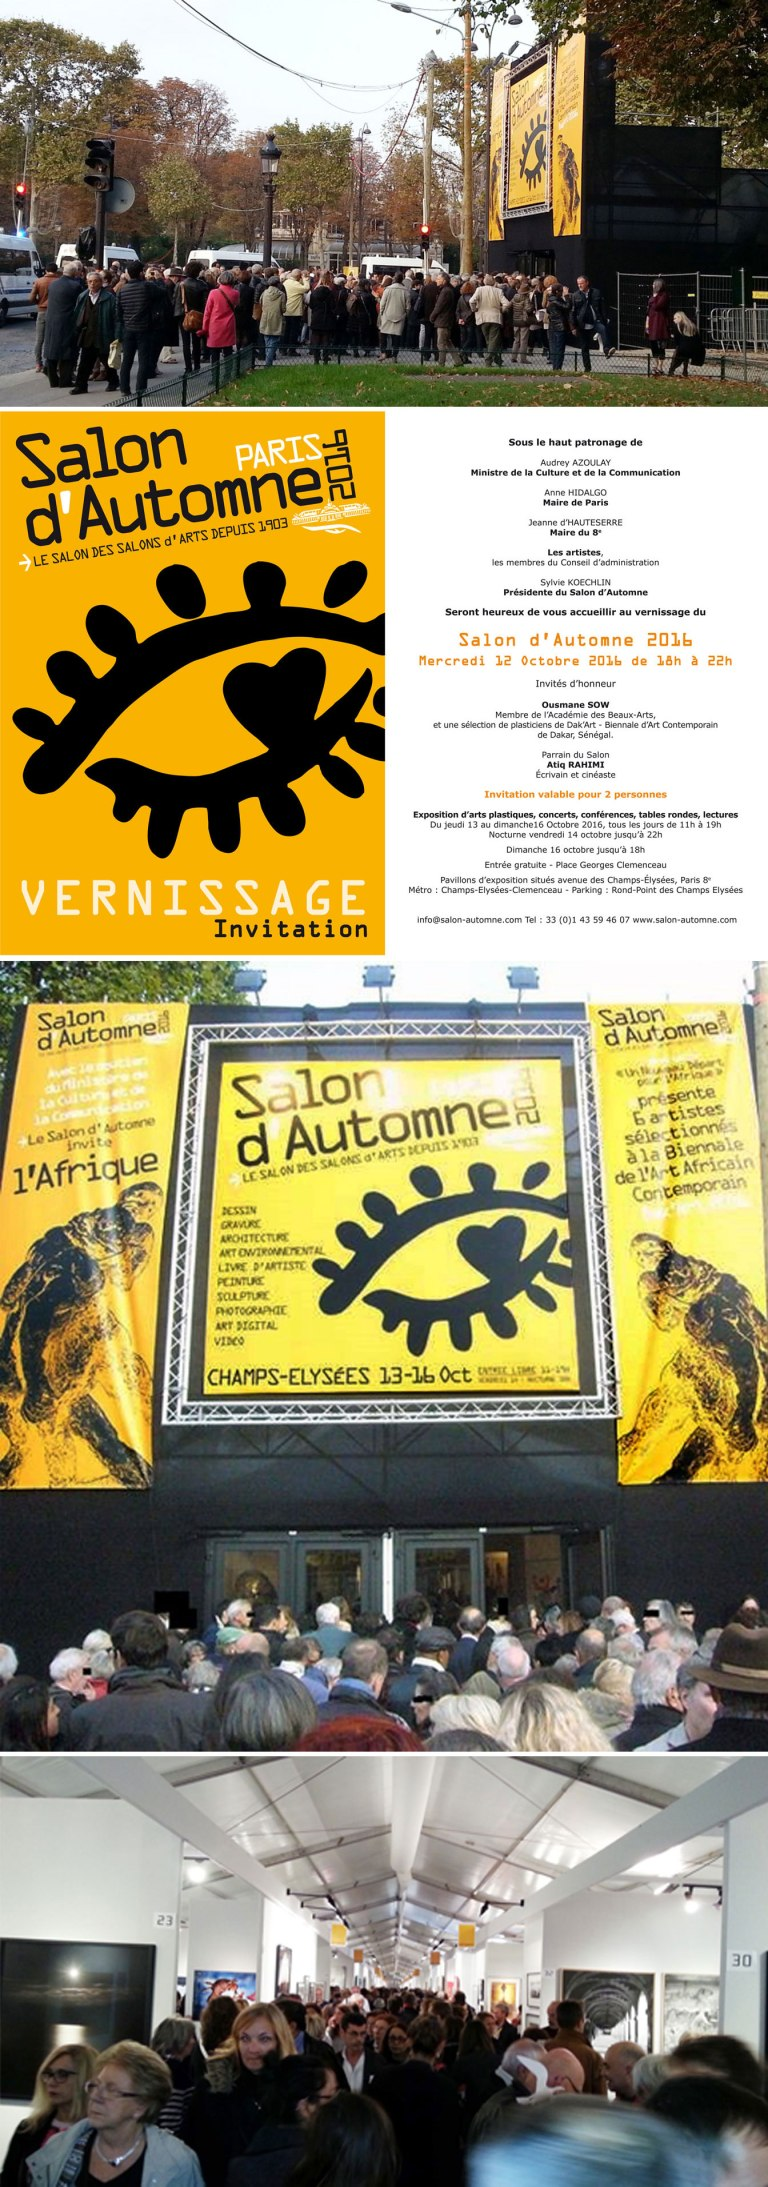 salon-automne_paris_2016_goddyn-helene_art-digita_dessin_1-1